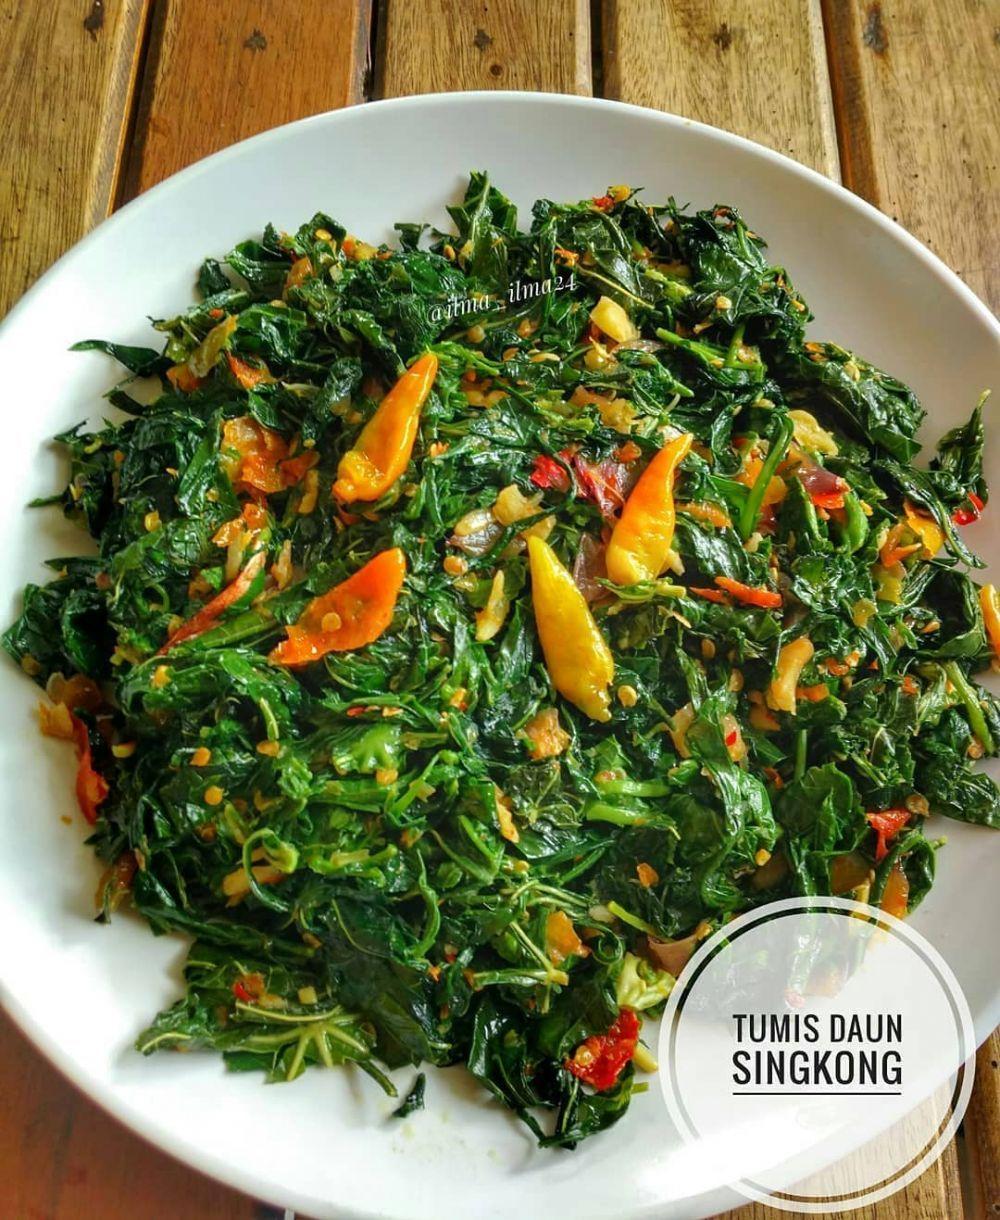 Resep Masakan Sehari Hari Olahan Daun Singkong Instagram Di 2021 Resep Masakan Masakan Resep